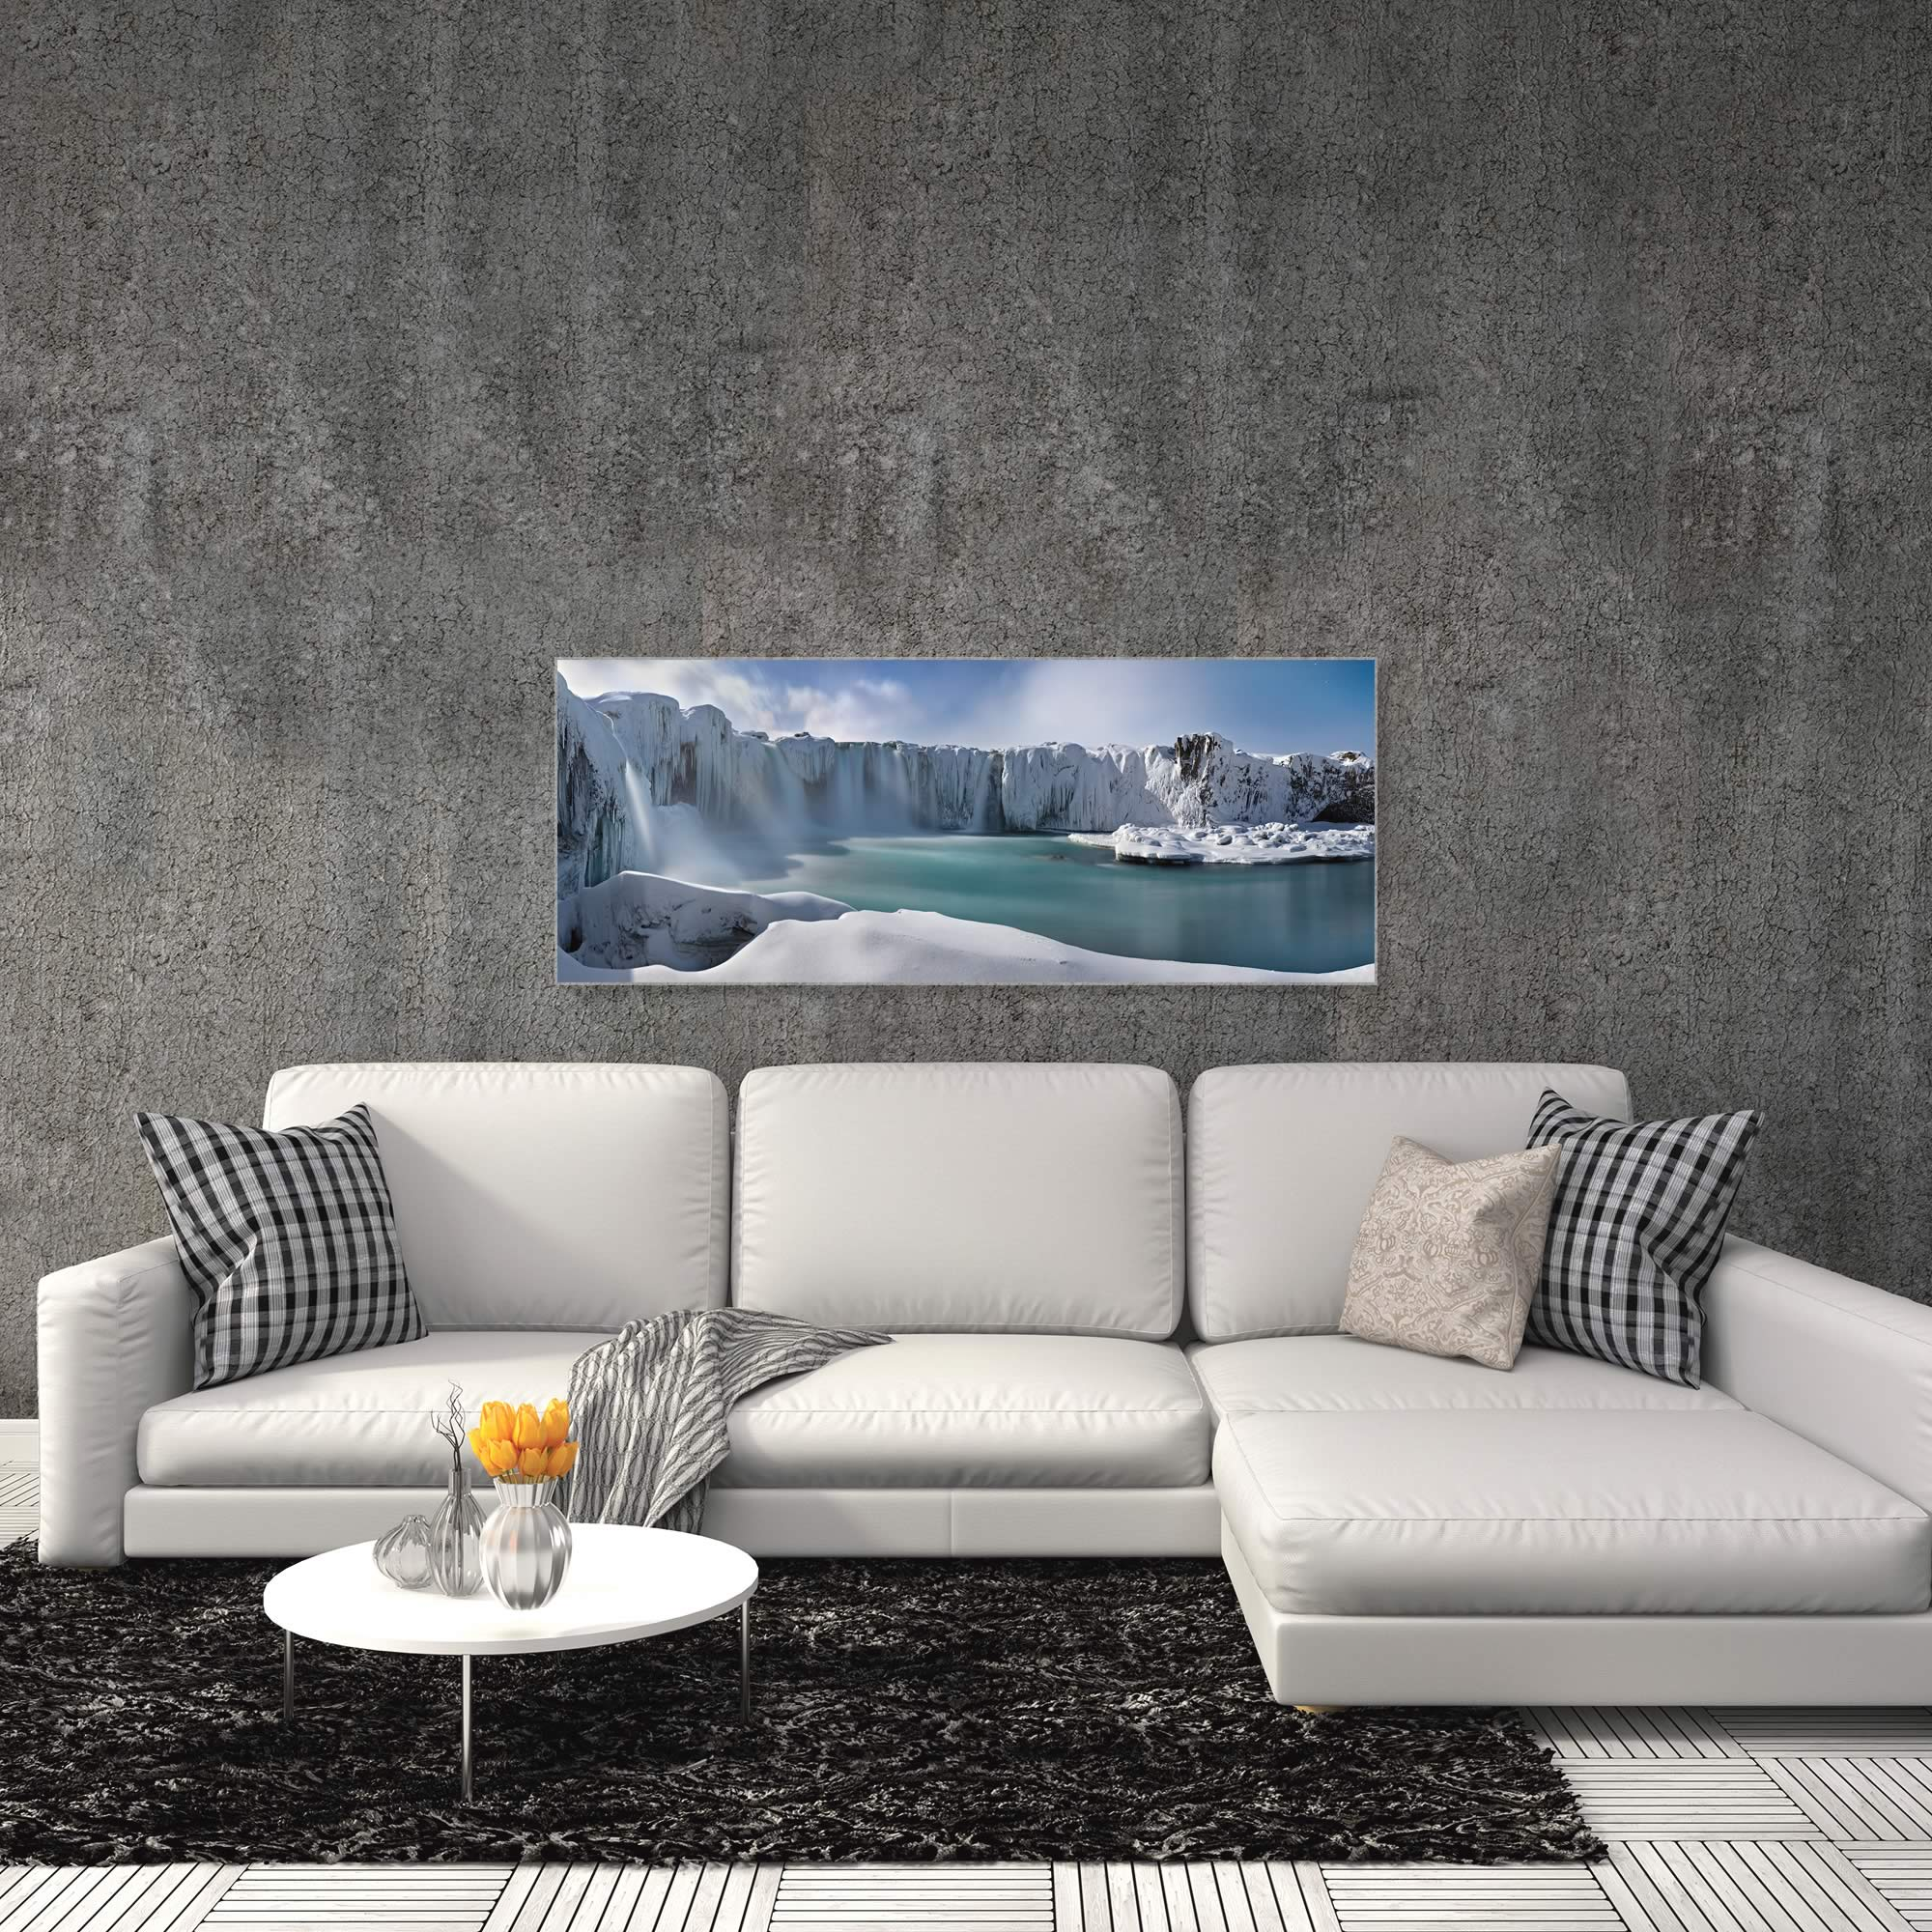 A Dream in the Moonlight by Valeriy Shcherbina - Snowy Landscape Art on Metal or Acrylic - Alternate View 3